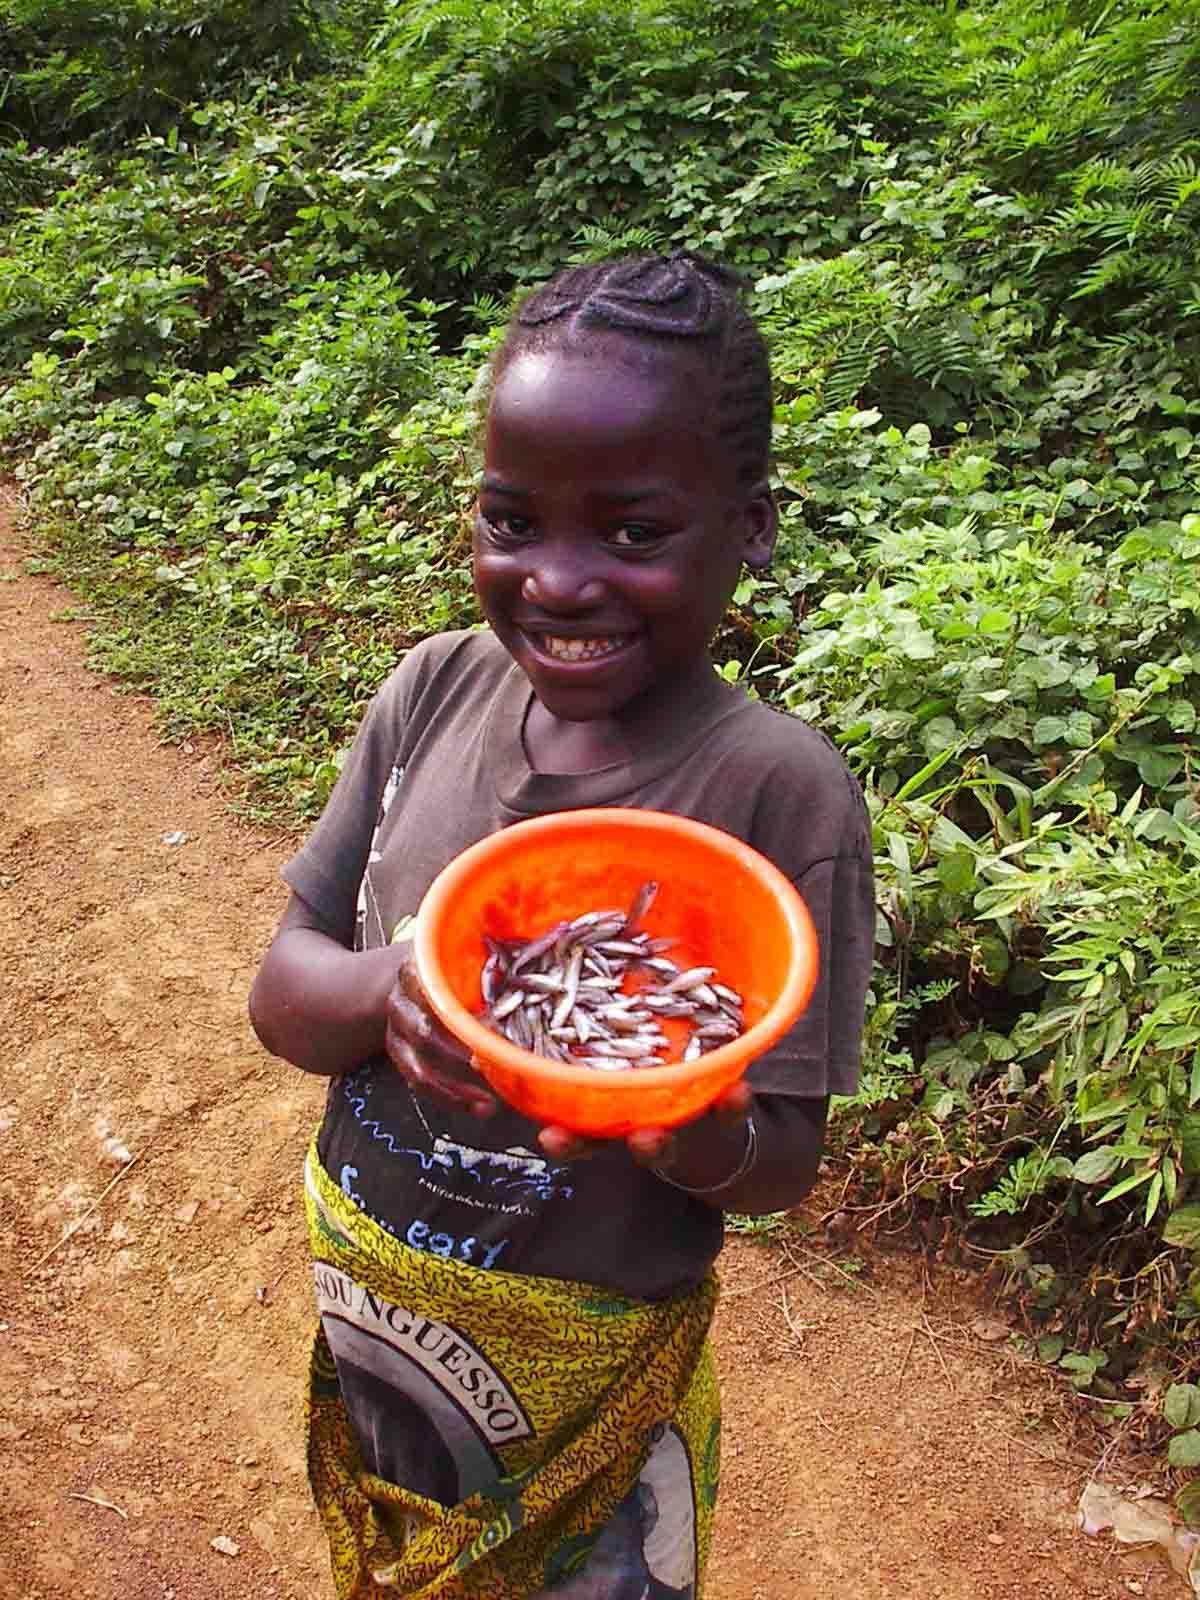 http://jambo.africa.kyoto-u.ac.jp/cgi-bin/CameroonFS/wiki.cgi?action=ATTACH&page=%BF%B9%A4%CE%BF%CD%A4%C8%B5%FB%A4%BF%A4%C1&file=Beyene%A4%CE%A5%B3%A5%D4%A1%BC%2Ejpg